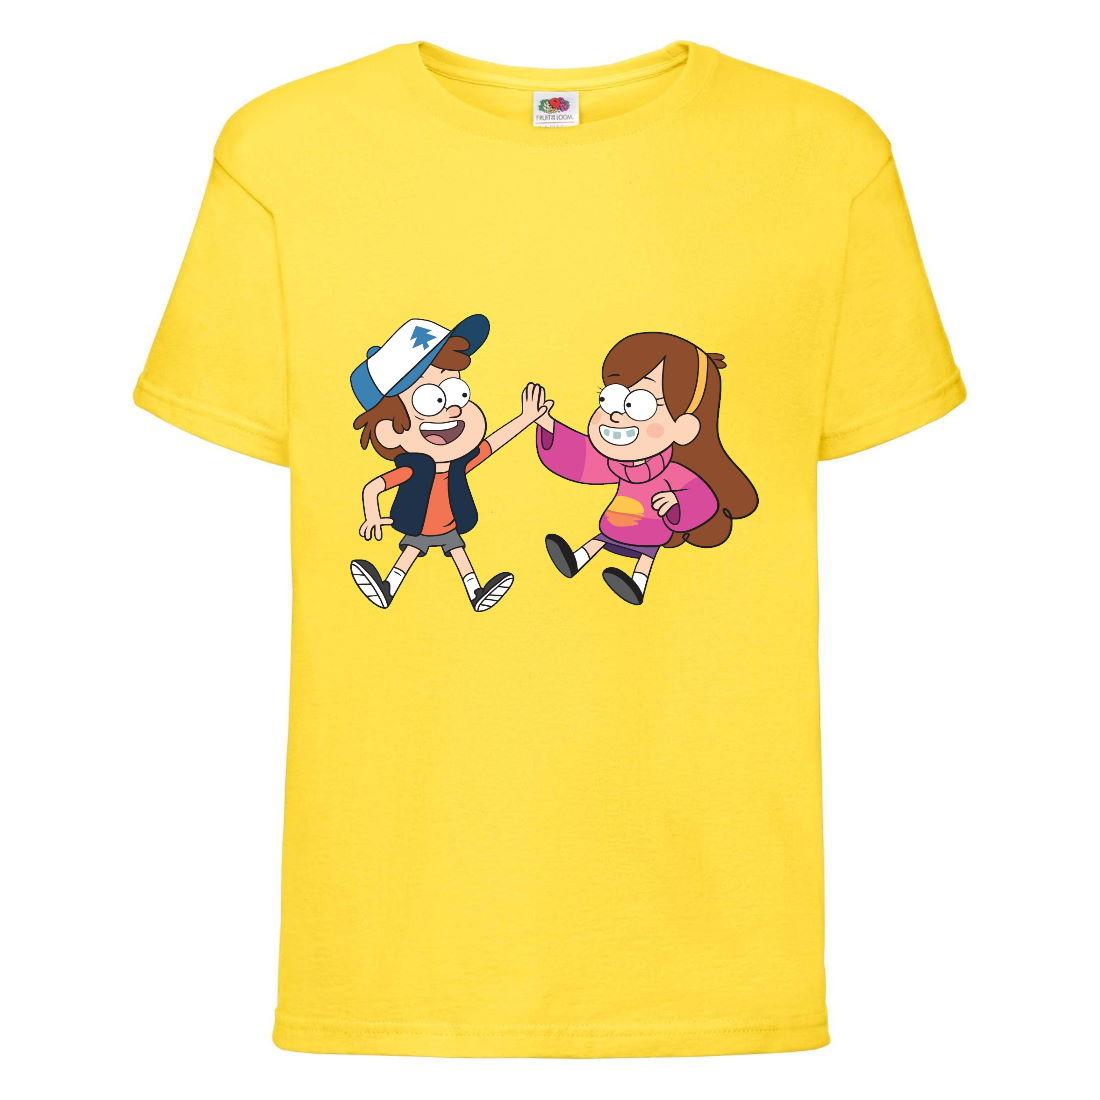 Футболка детская Гравити Фолз Мэйб и Диппер 11 (Gravity Falls Mayb and Dipper 11) желтая (GF yl-05) 152 см